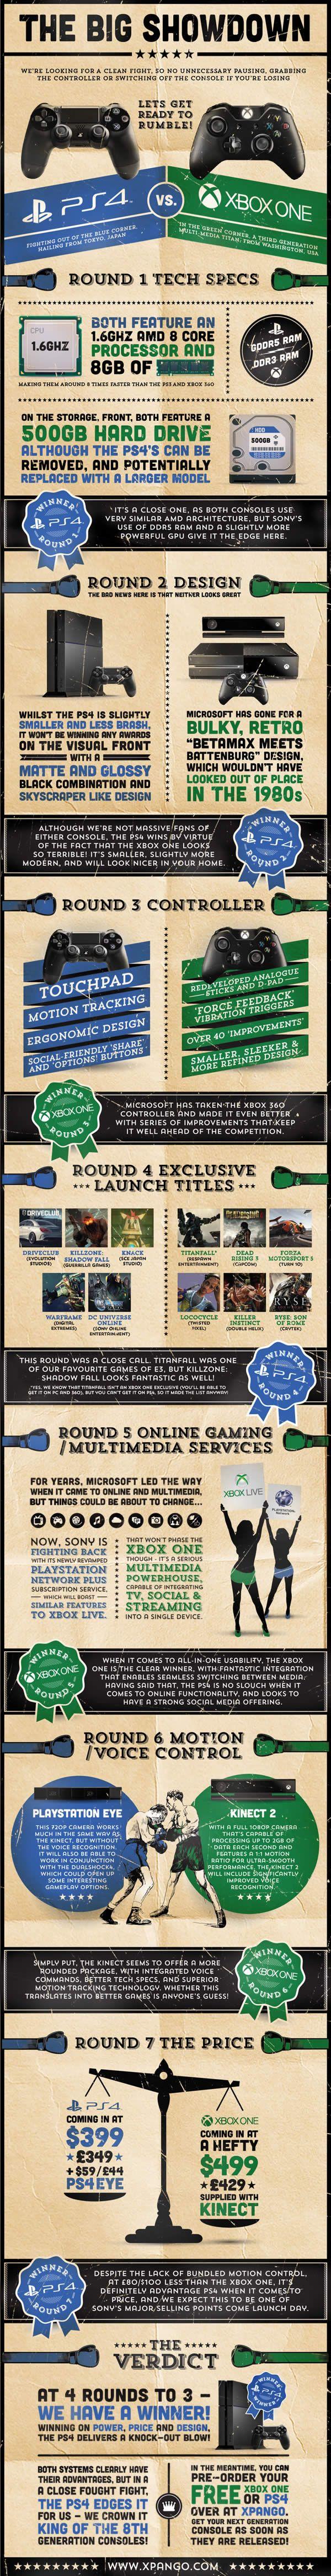 Infographic: The Big Showdown - Where #PS4 wins! - @Xpango